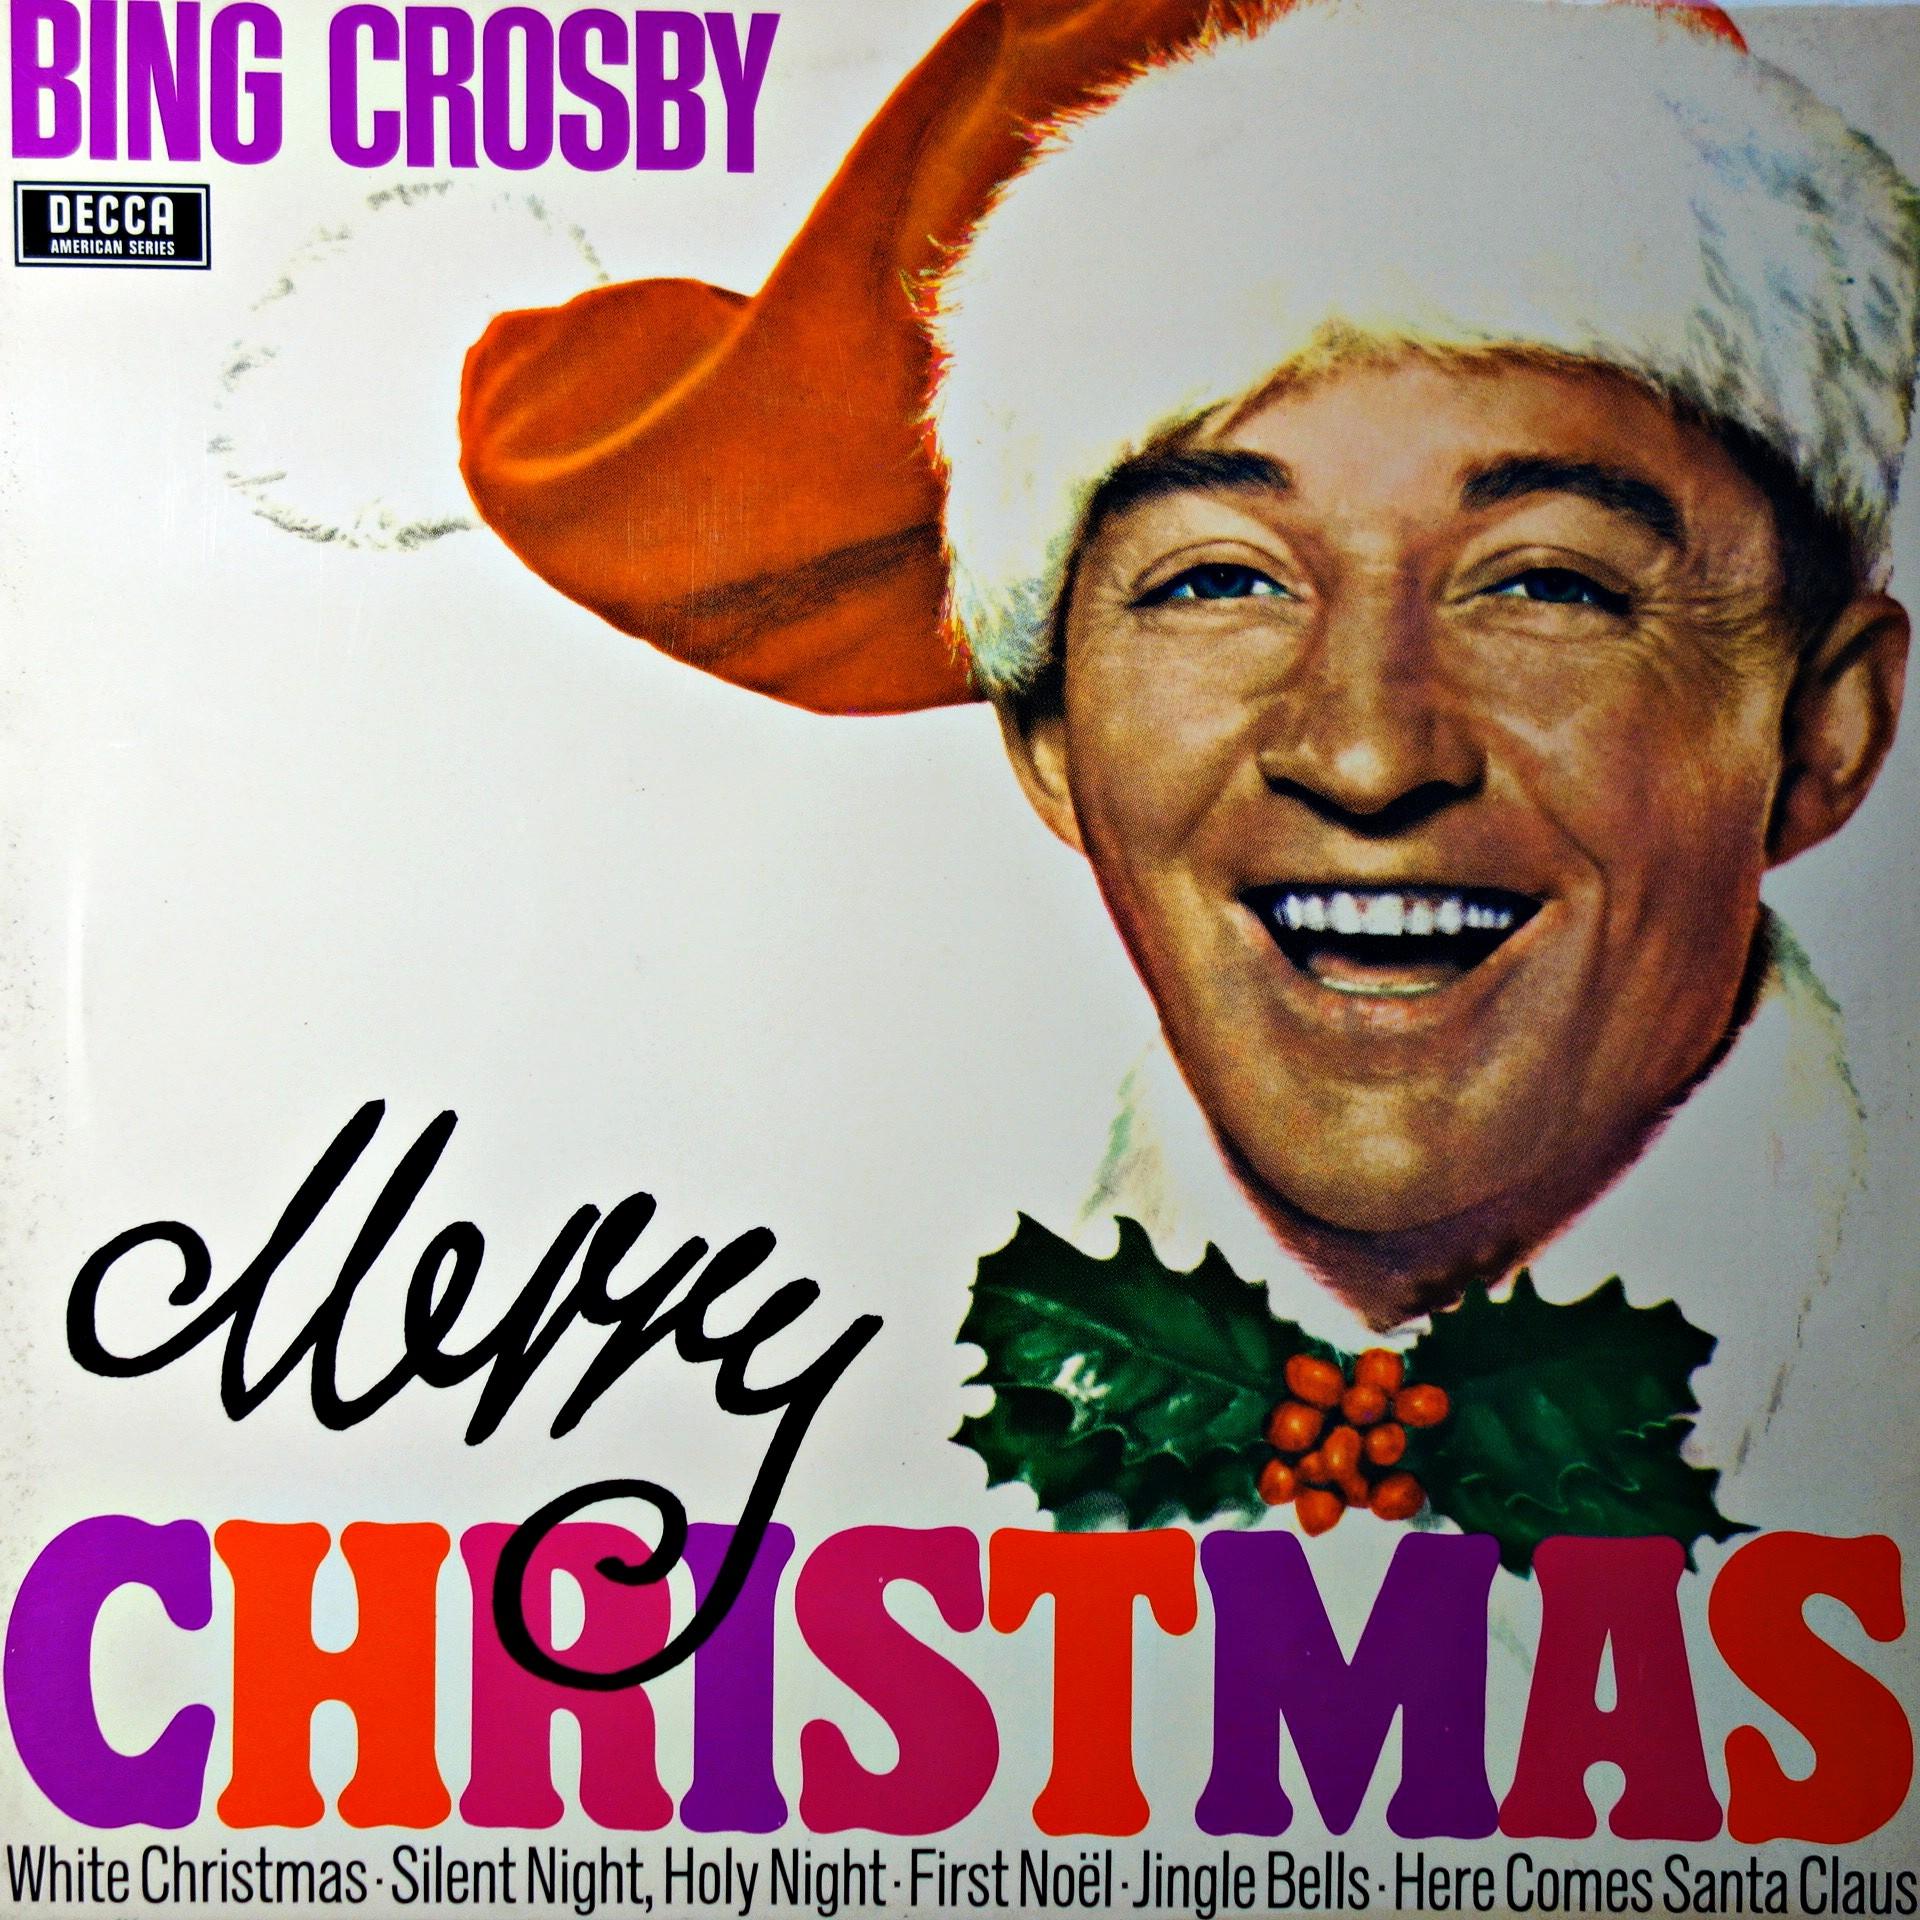 Bing Crosby Merry Christmas.Lp Bing Crosby Merry Christmas